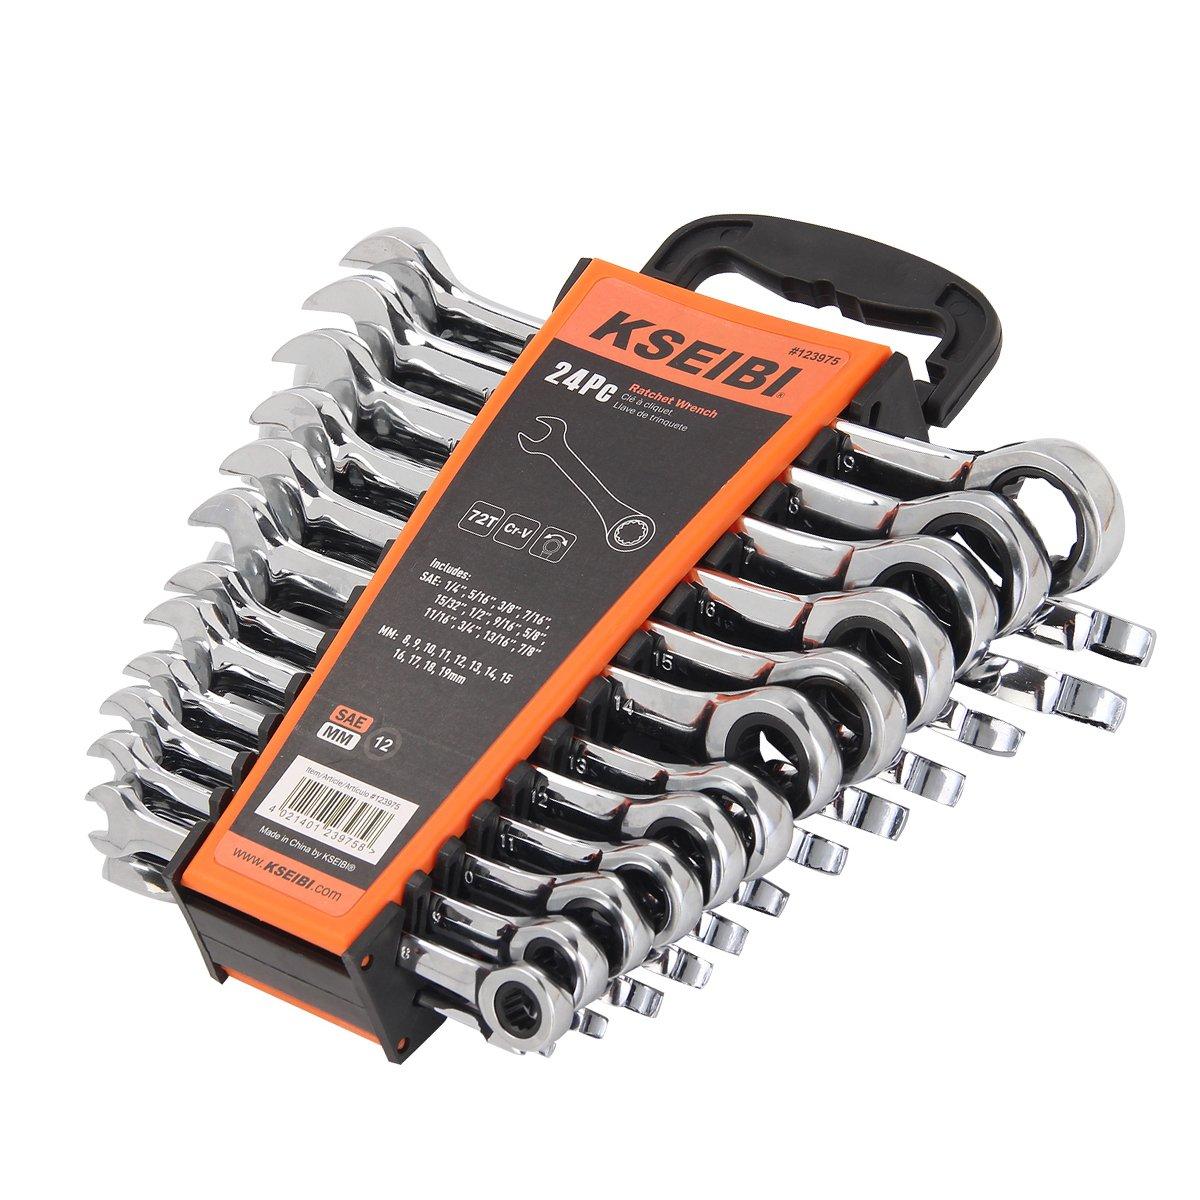 Chrome Vanadium Steel Ratchet Wrenches Kit with Storage Keeper SAE /& Metric KSEIBI 123975 24 Piece Ratcheting Combination Wrench Set